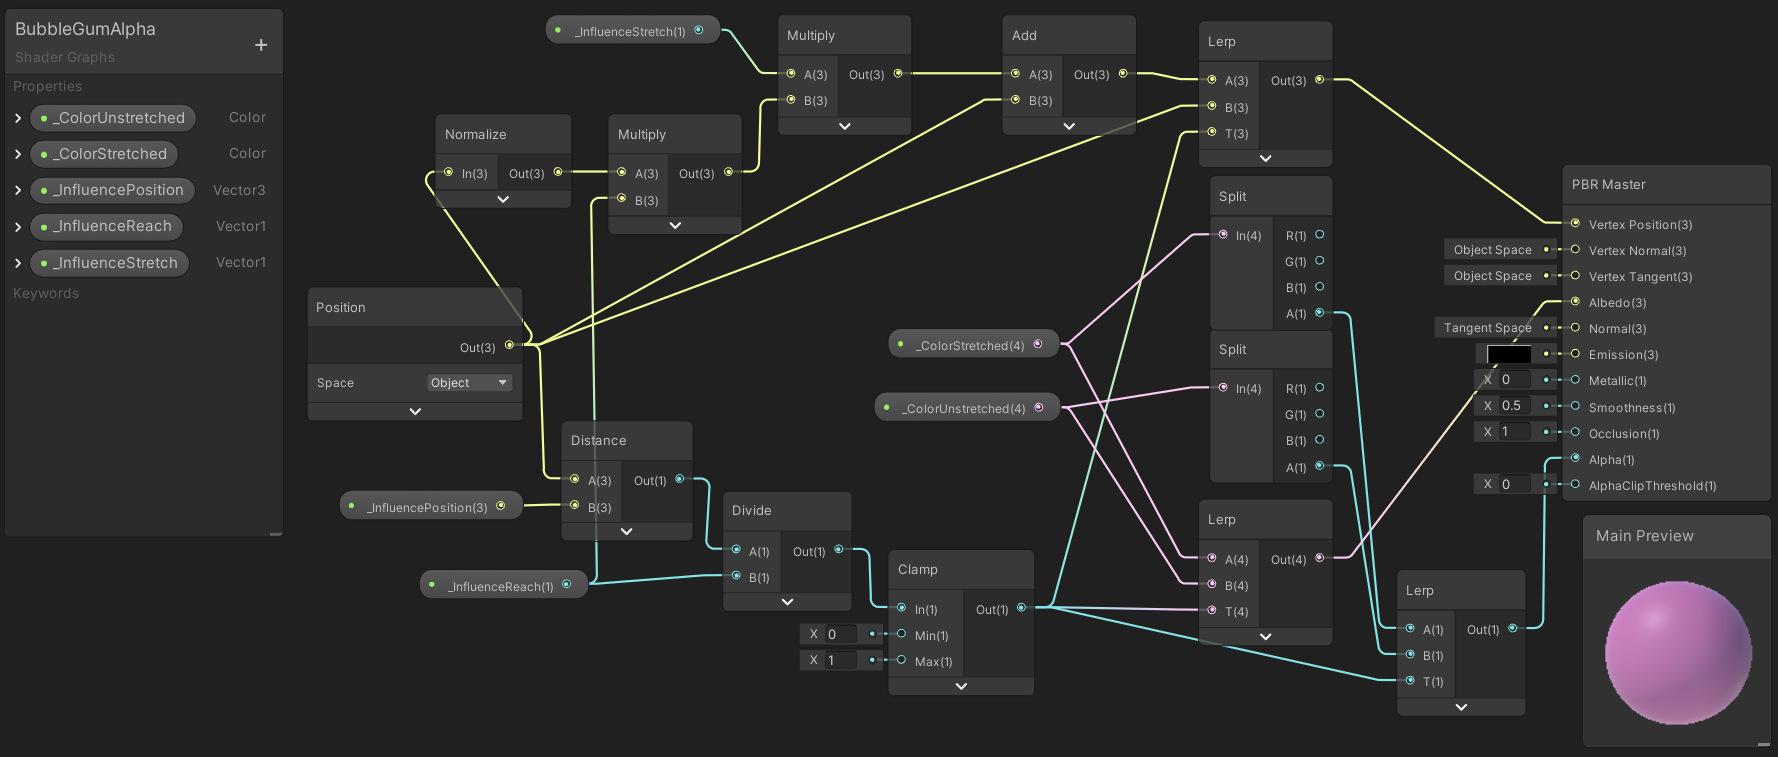 BubbleGumAlpha_ShaderGraph.jpg